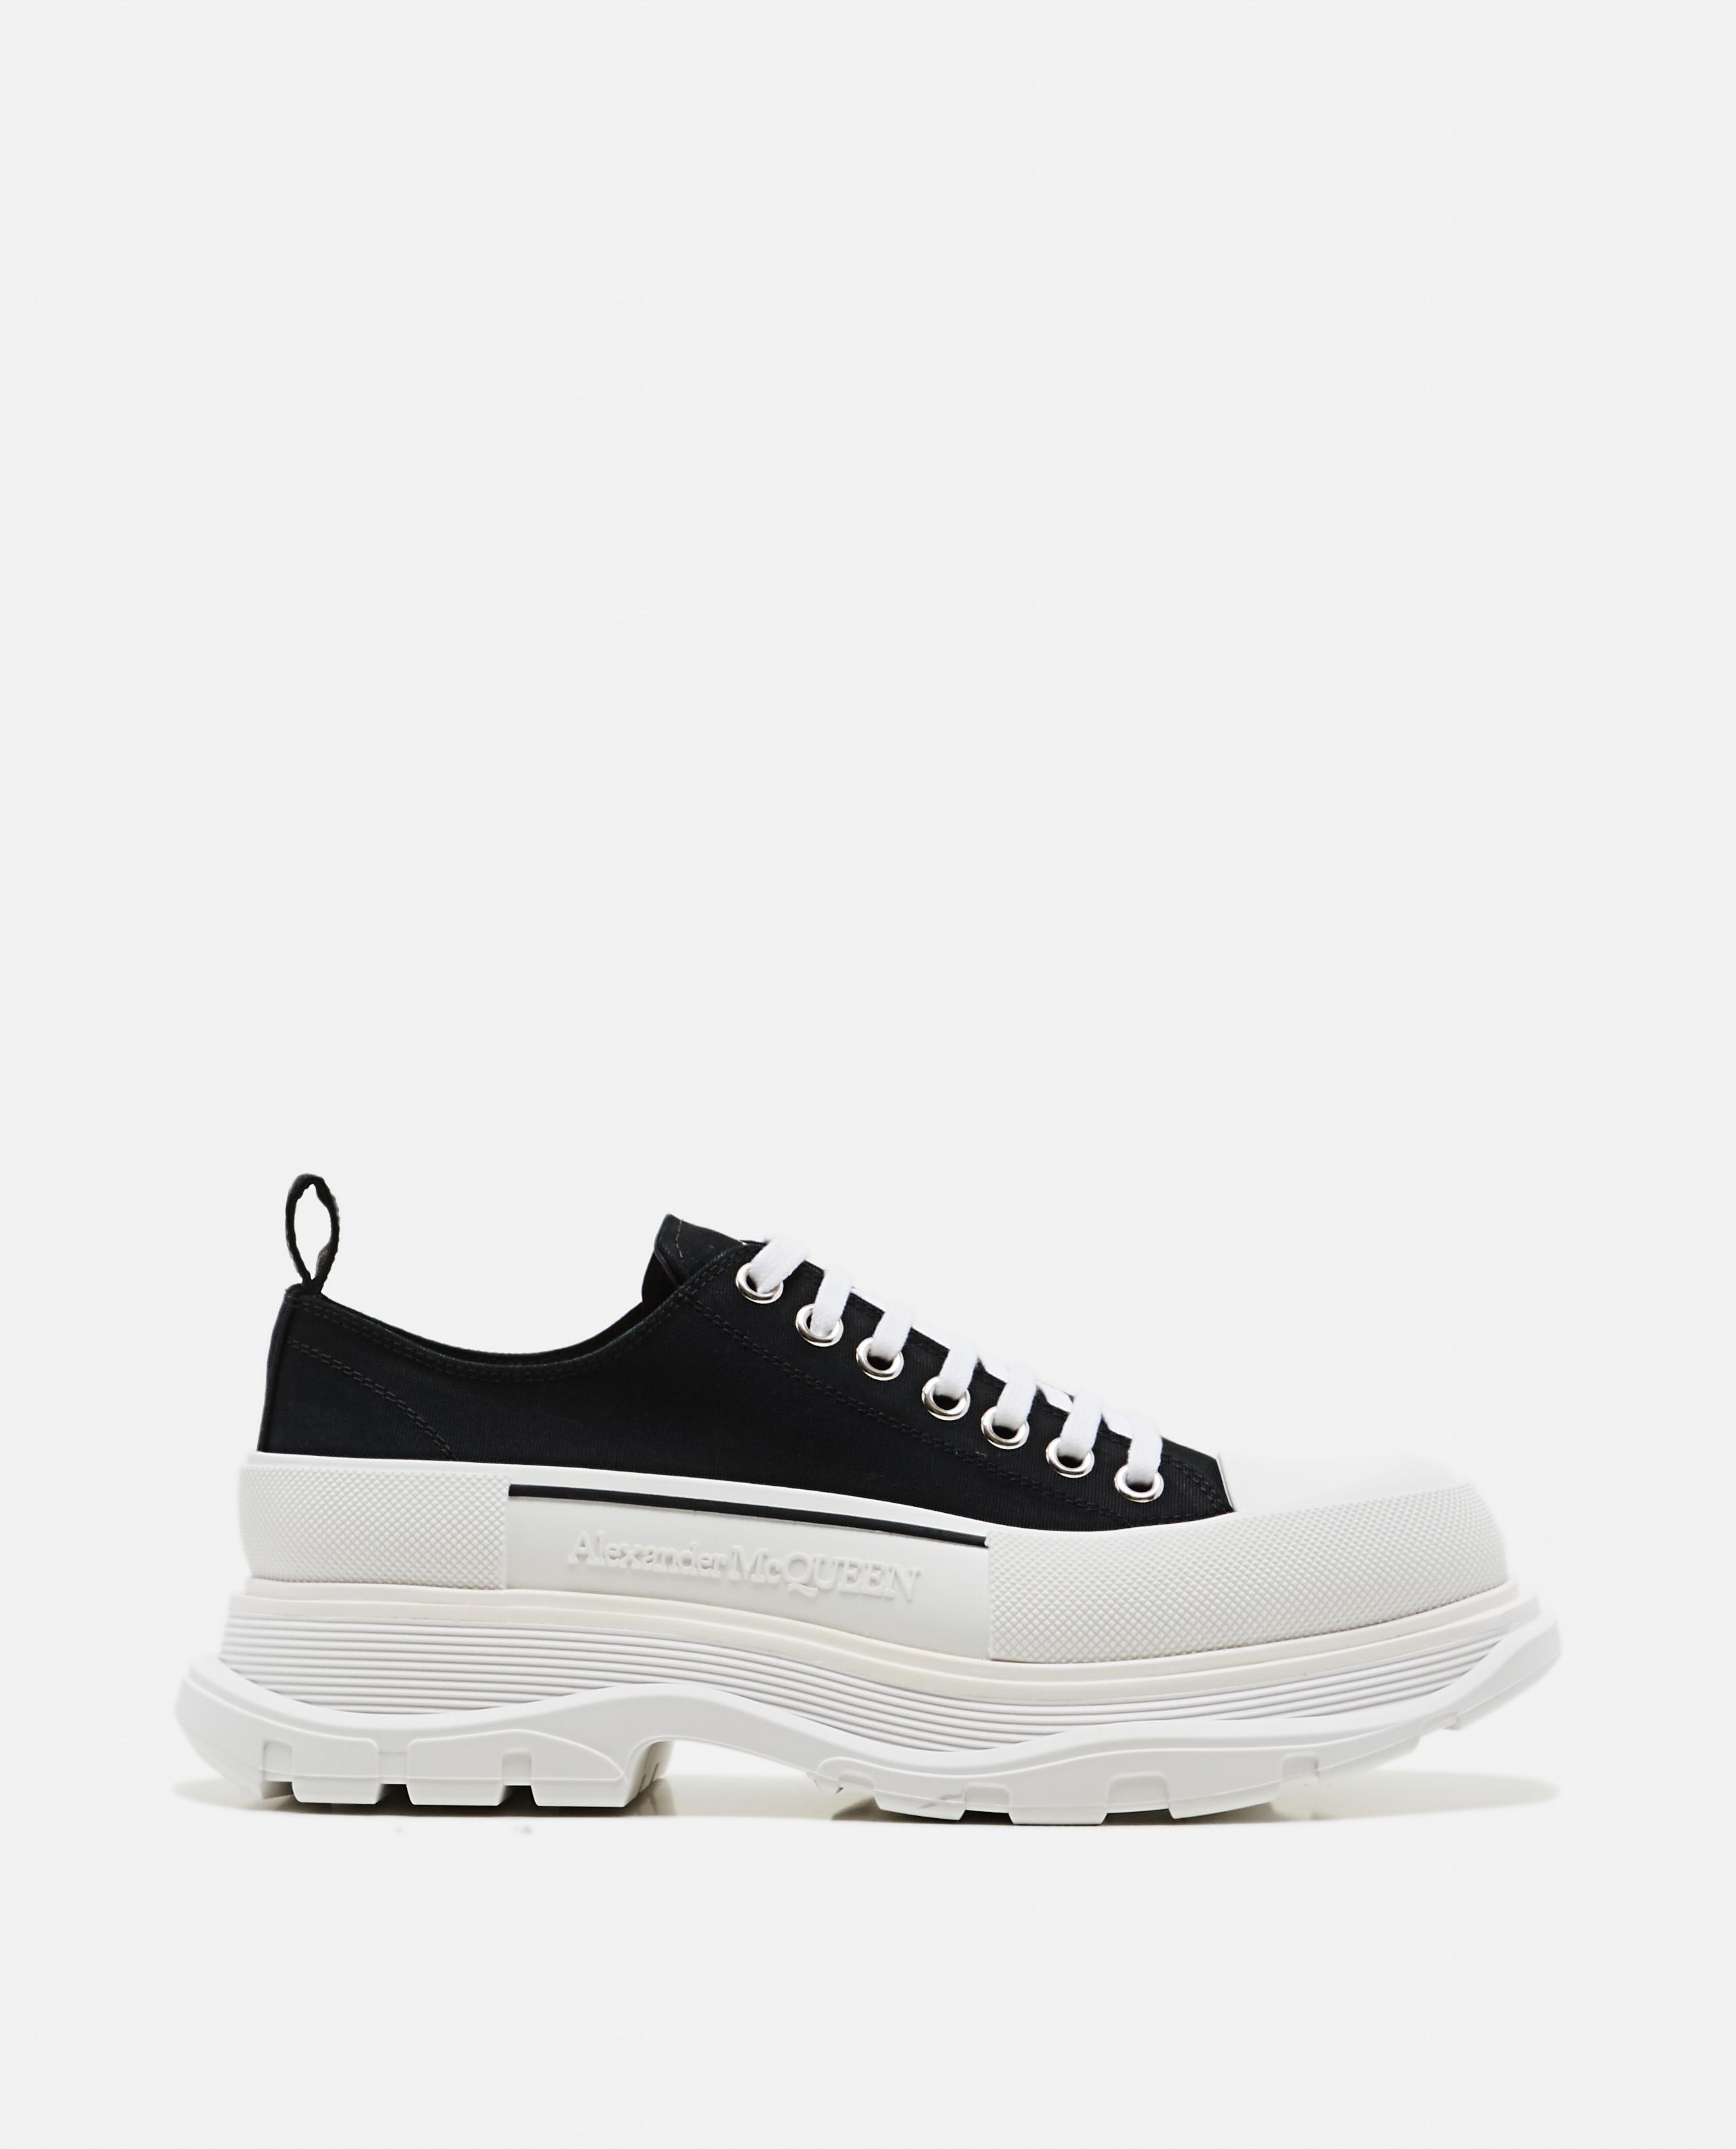 Tread Sleek laced shoes